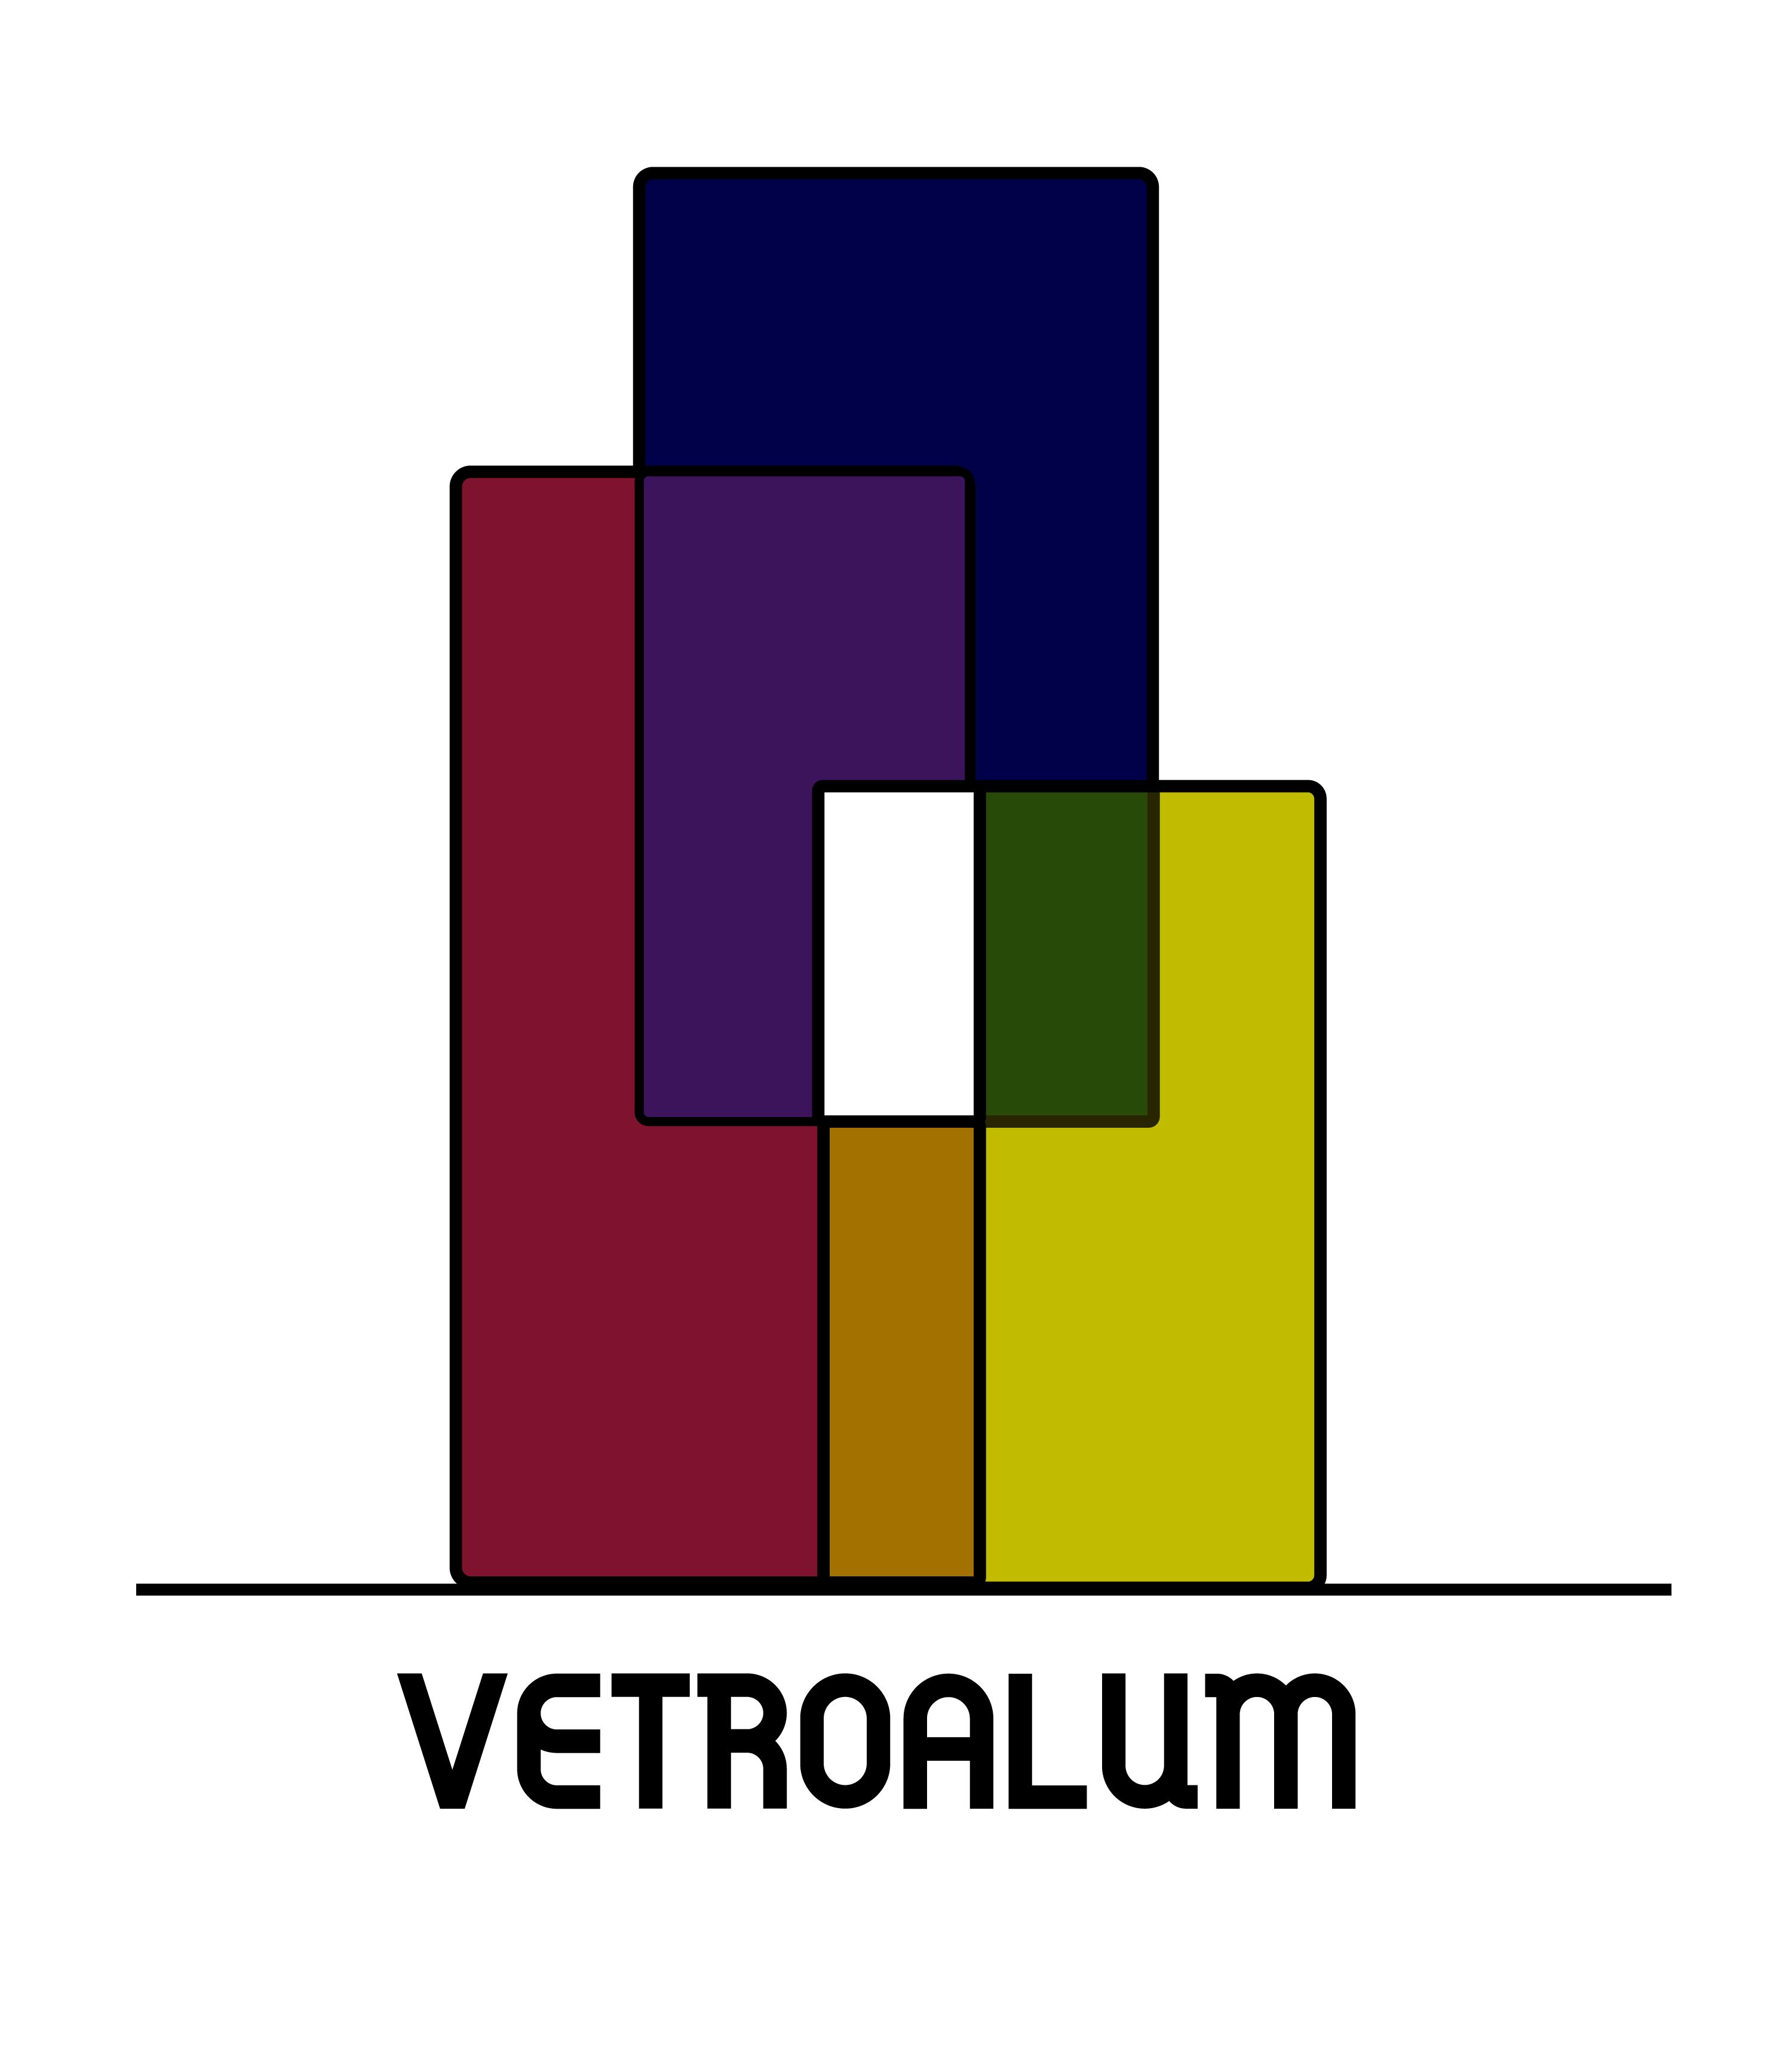 Vetroalum